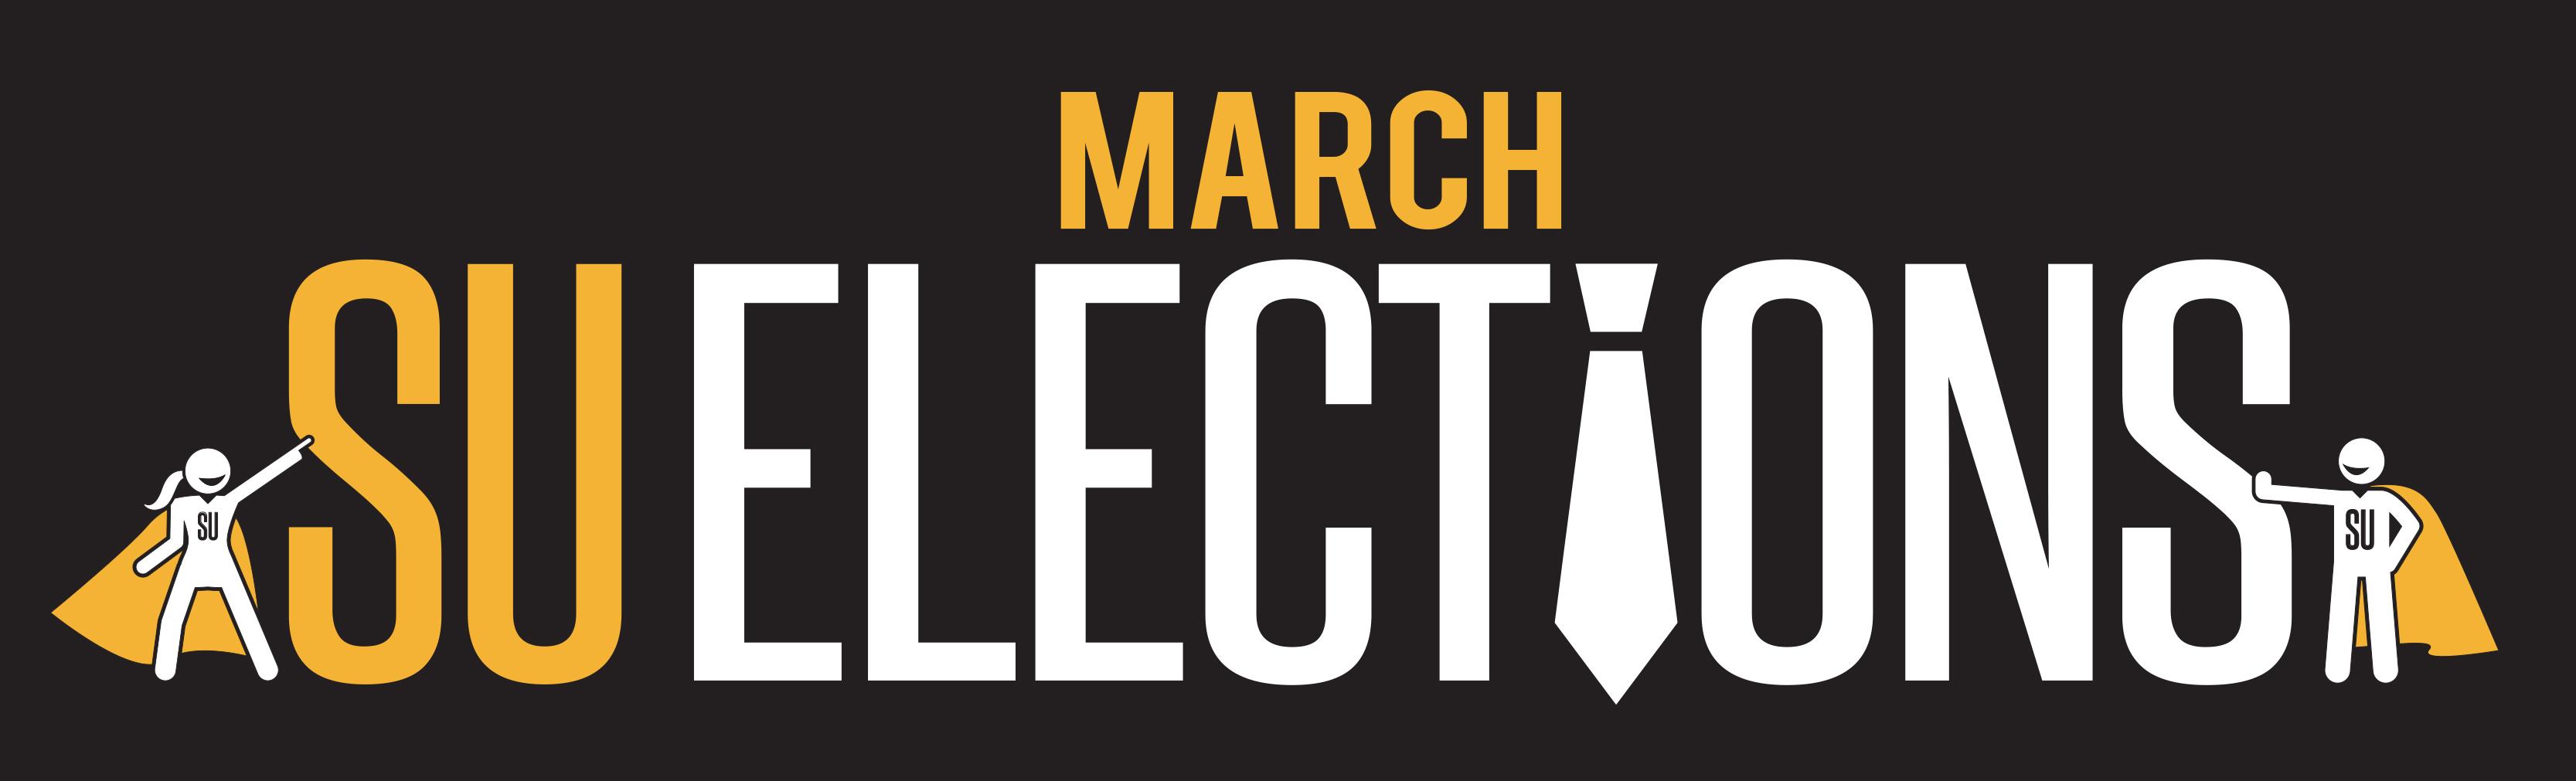 SU Elections 2019 - Webpage Banner